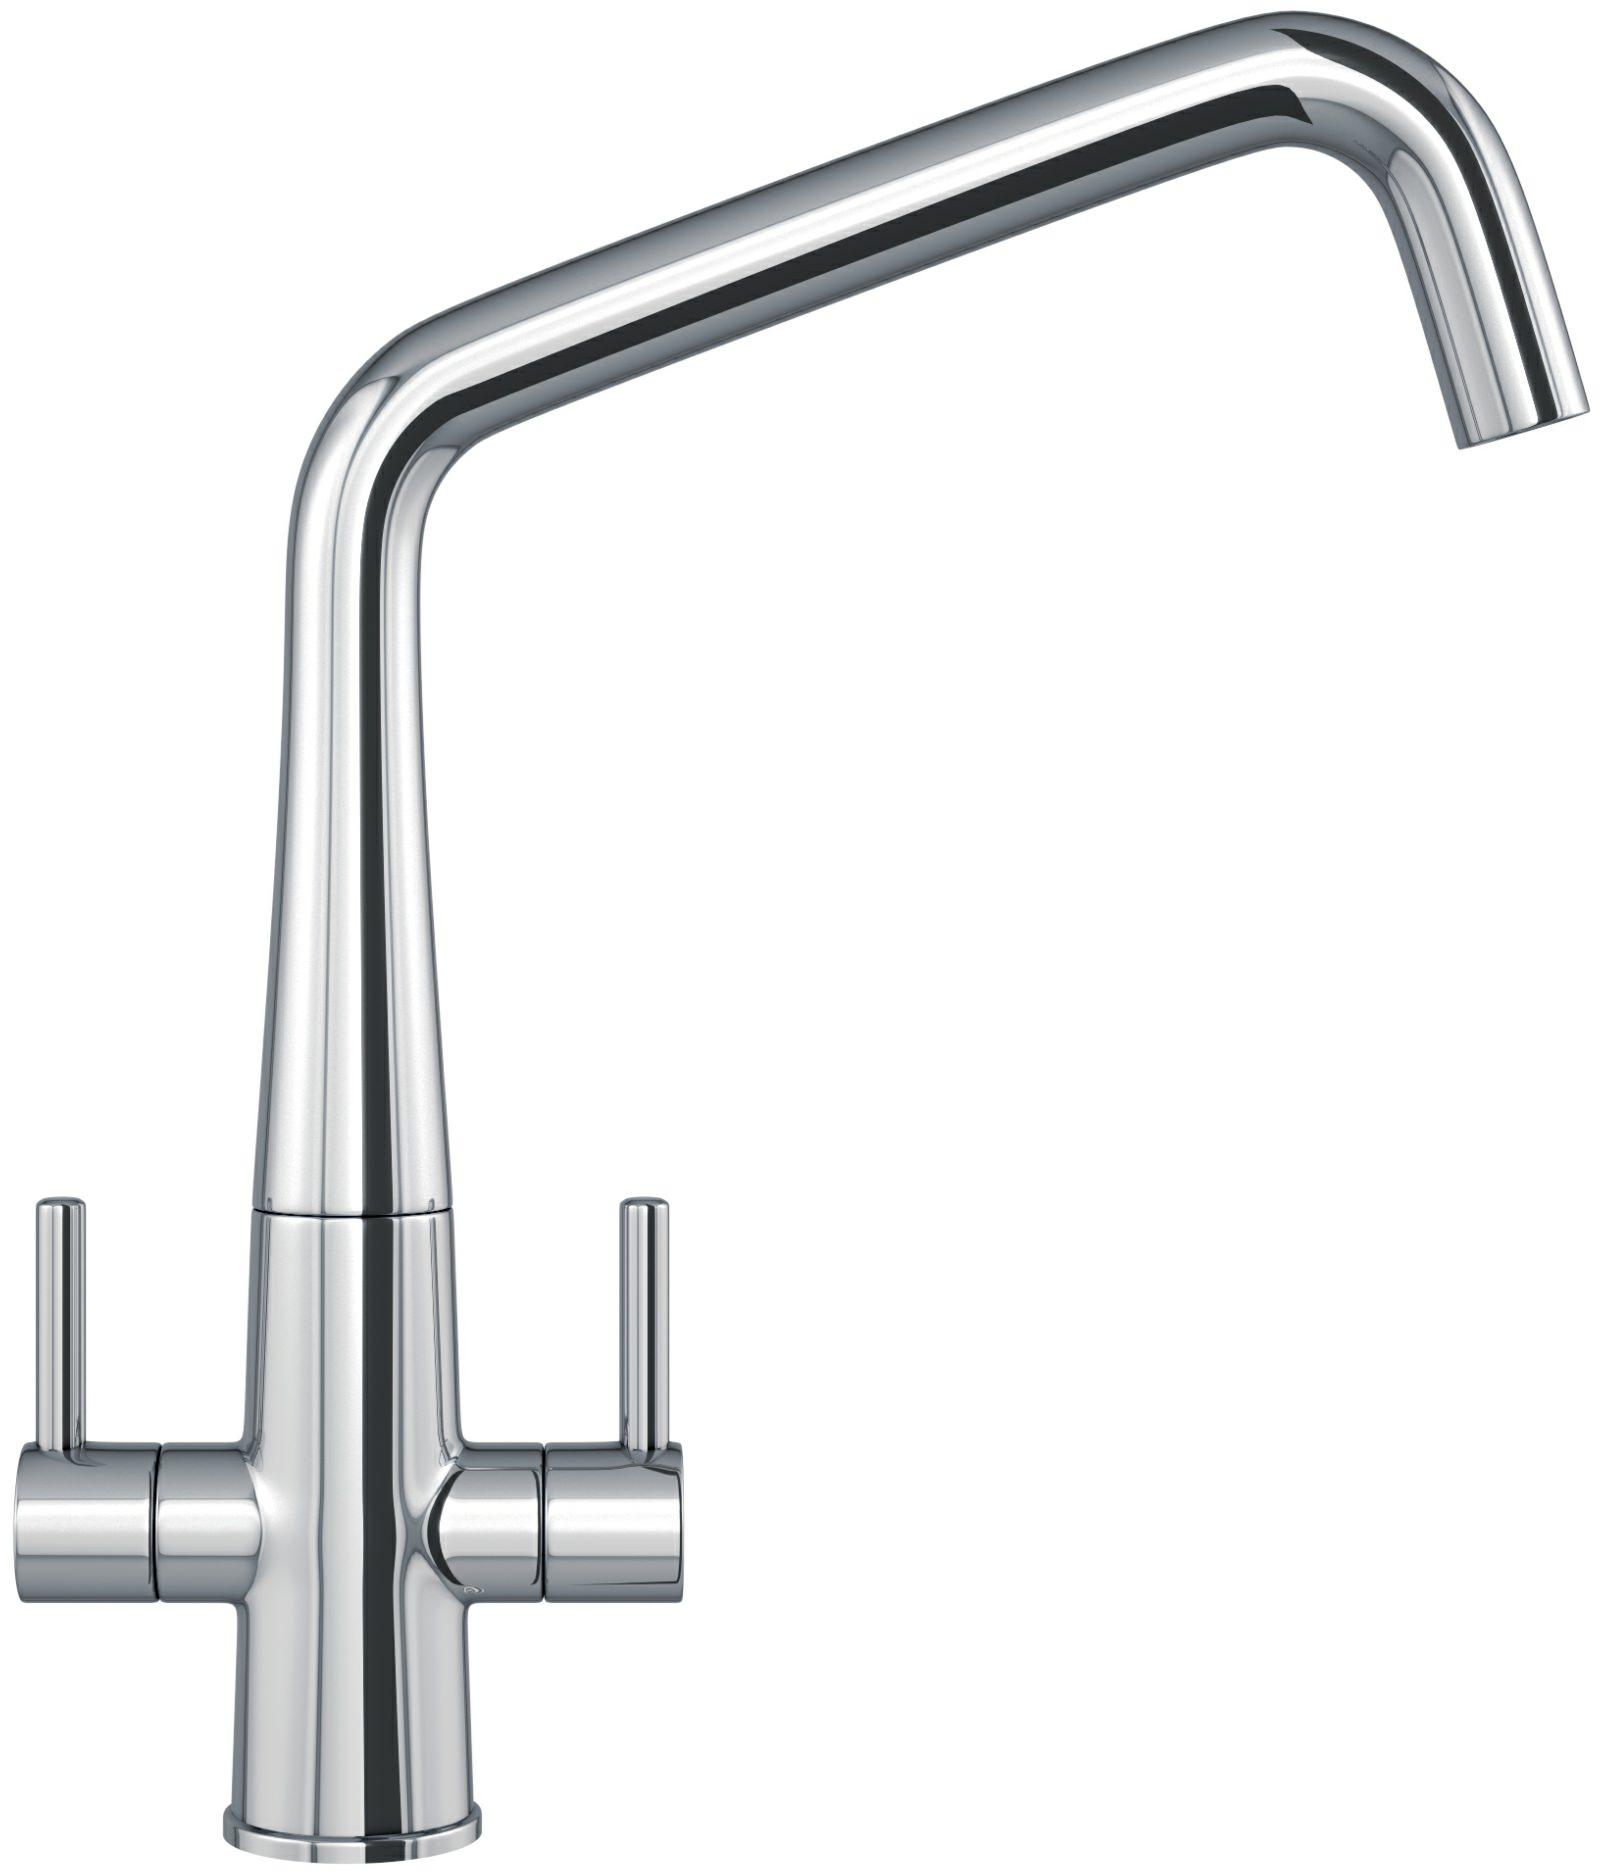 franke cristallo chrome kitchen sink mixer tap more. Black Bedroom Furniture Sets. Home Design Ideas